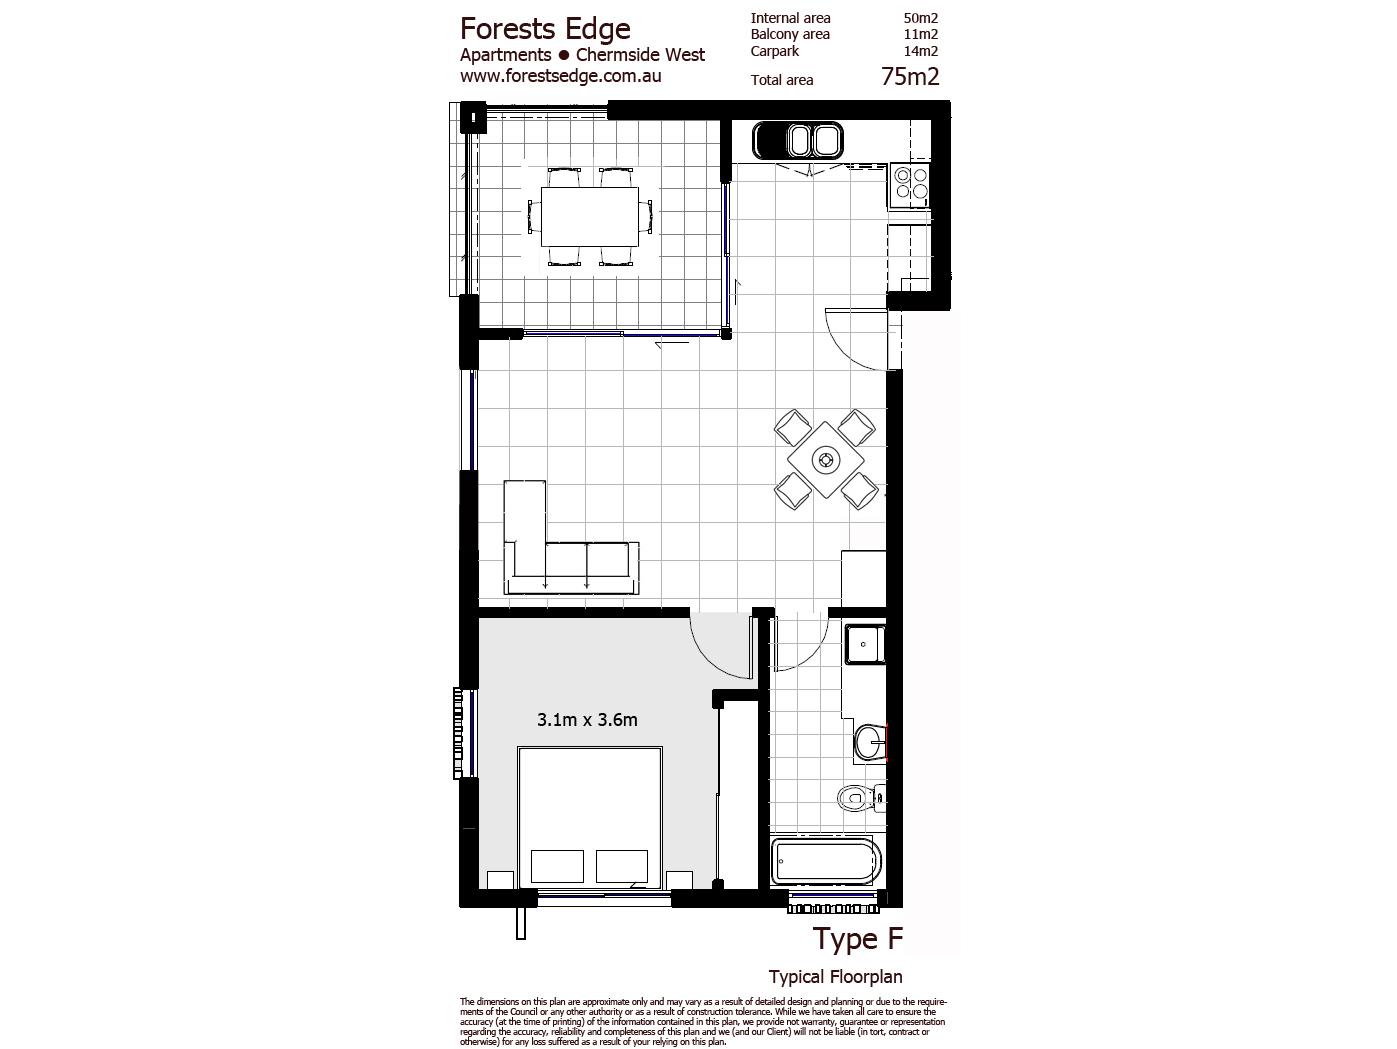 Type F Floorplan - One Bedroom Unit copy.jpg